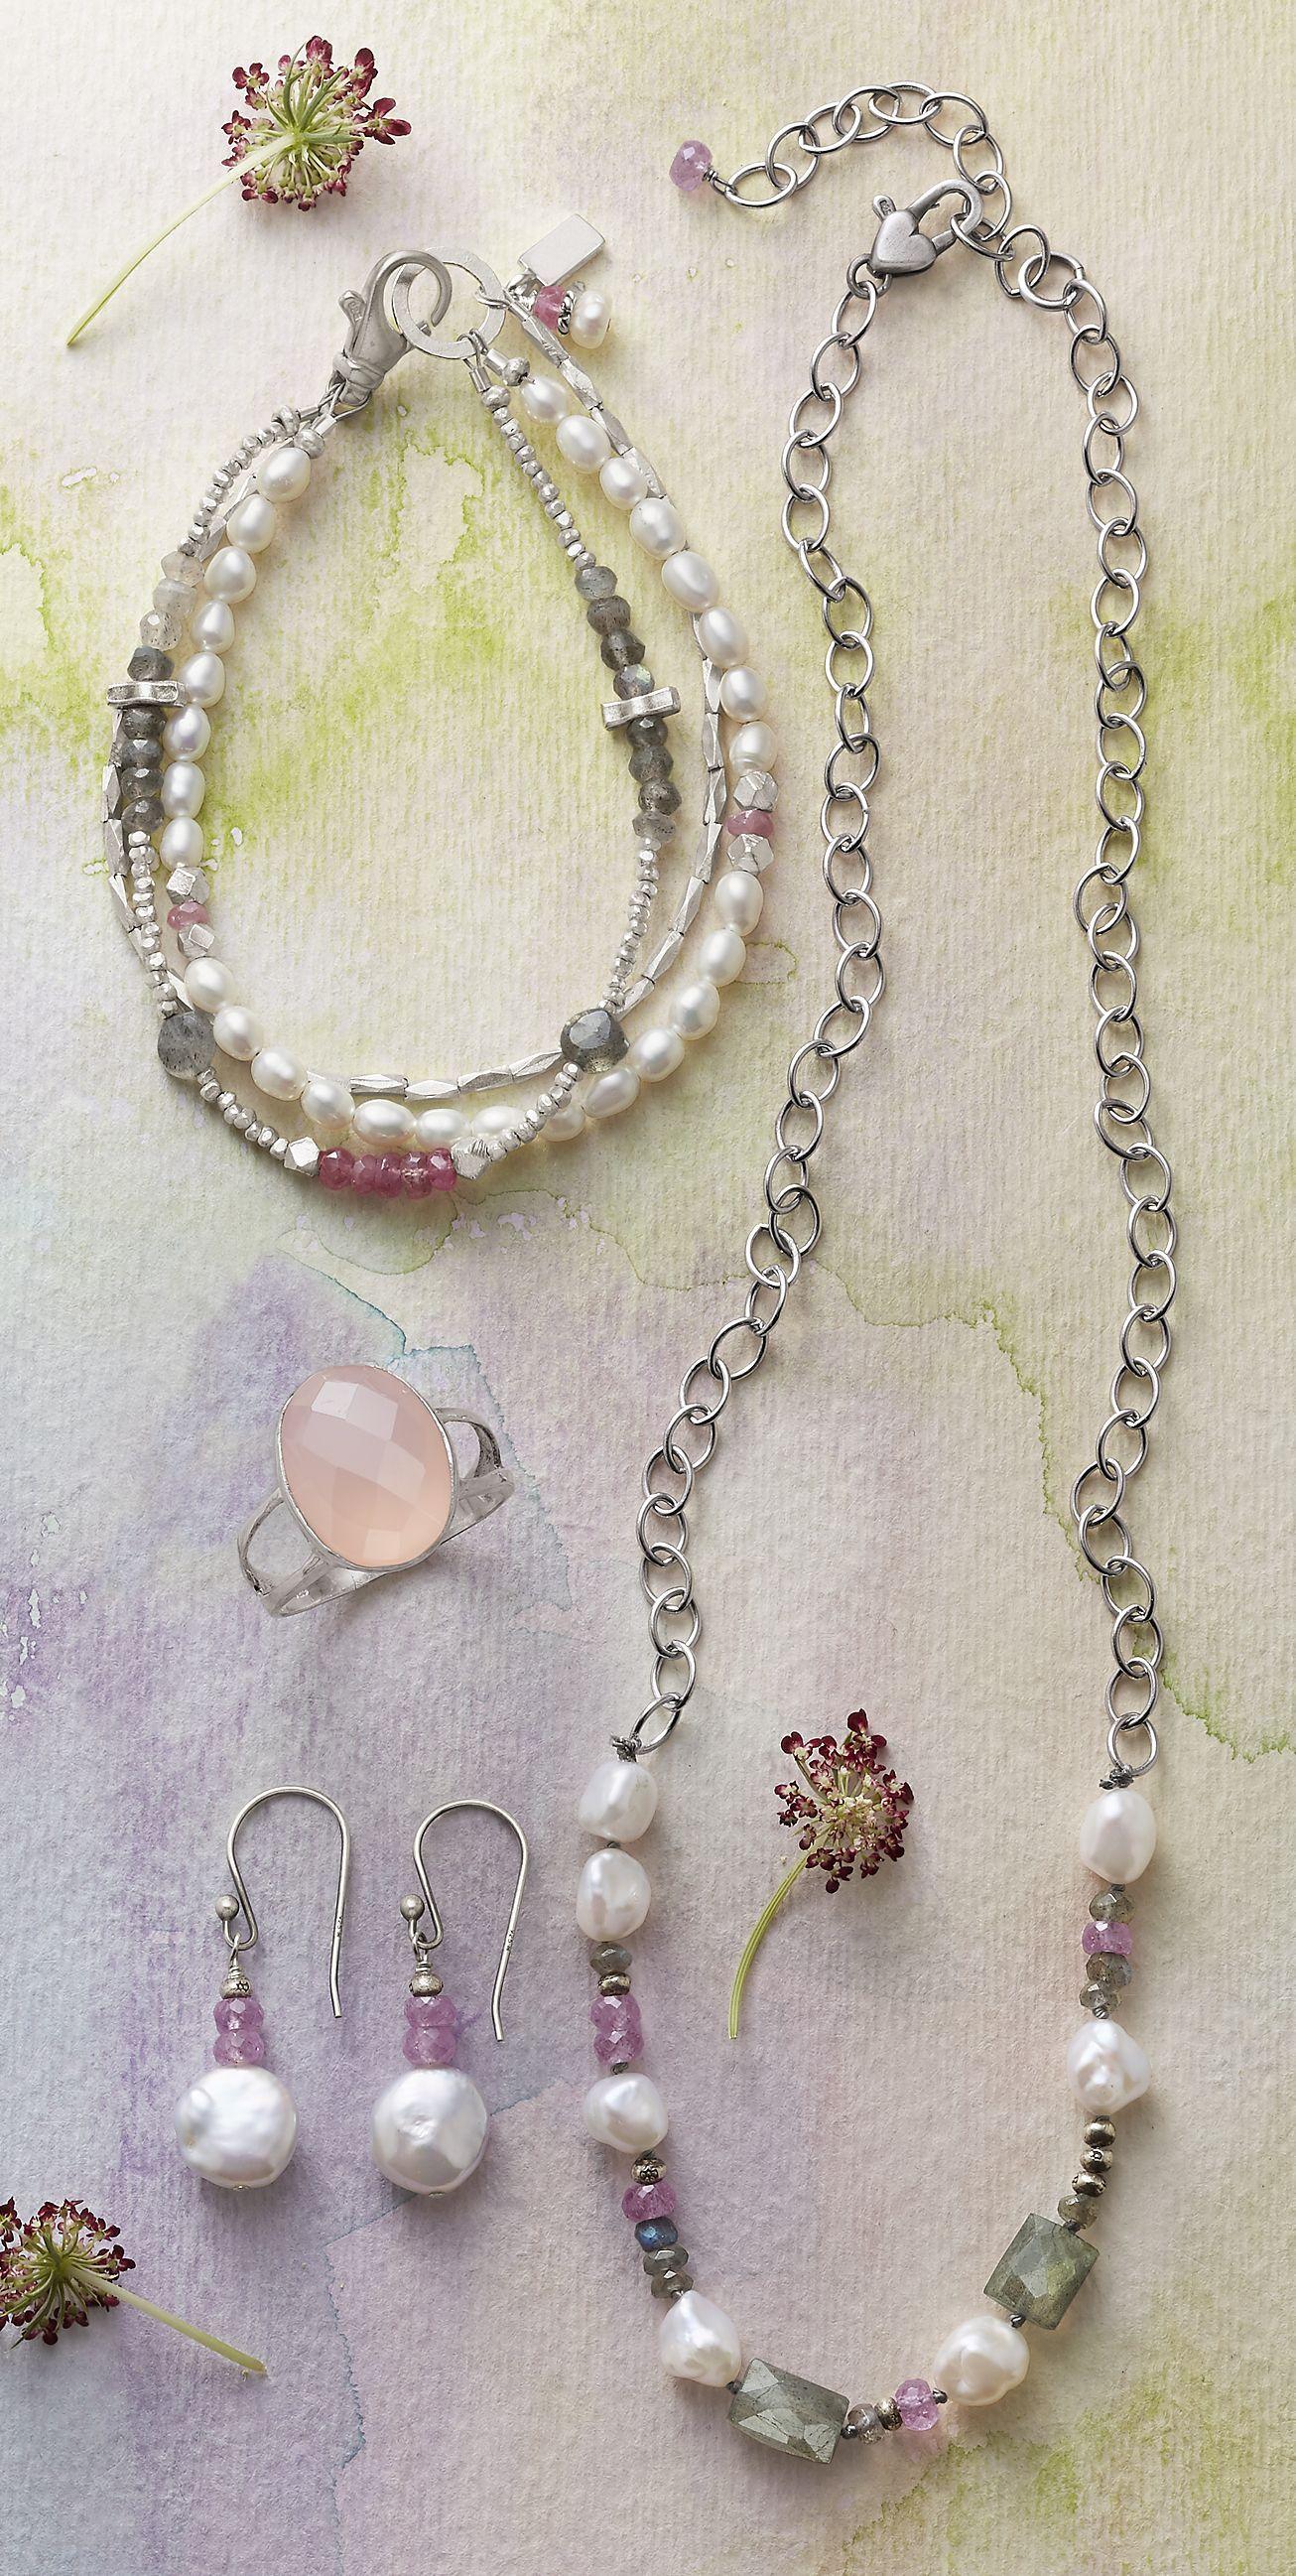 First Love Necklace Necklace, Earrings, & Bracelet  Luminous Glow